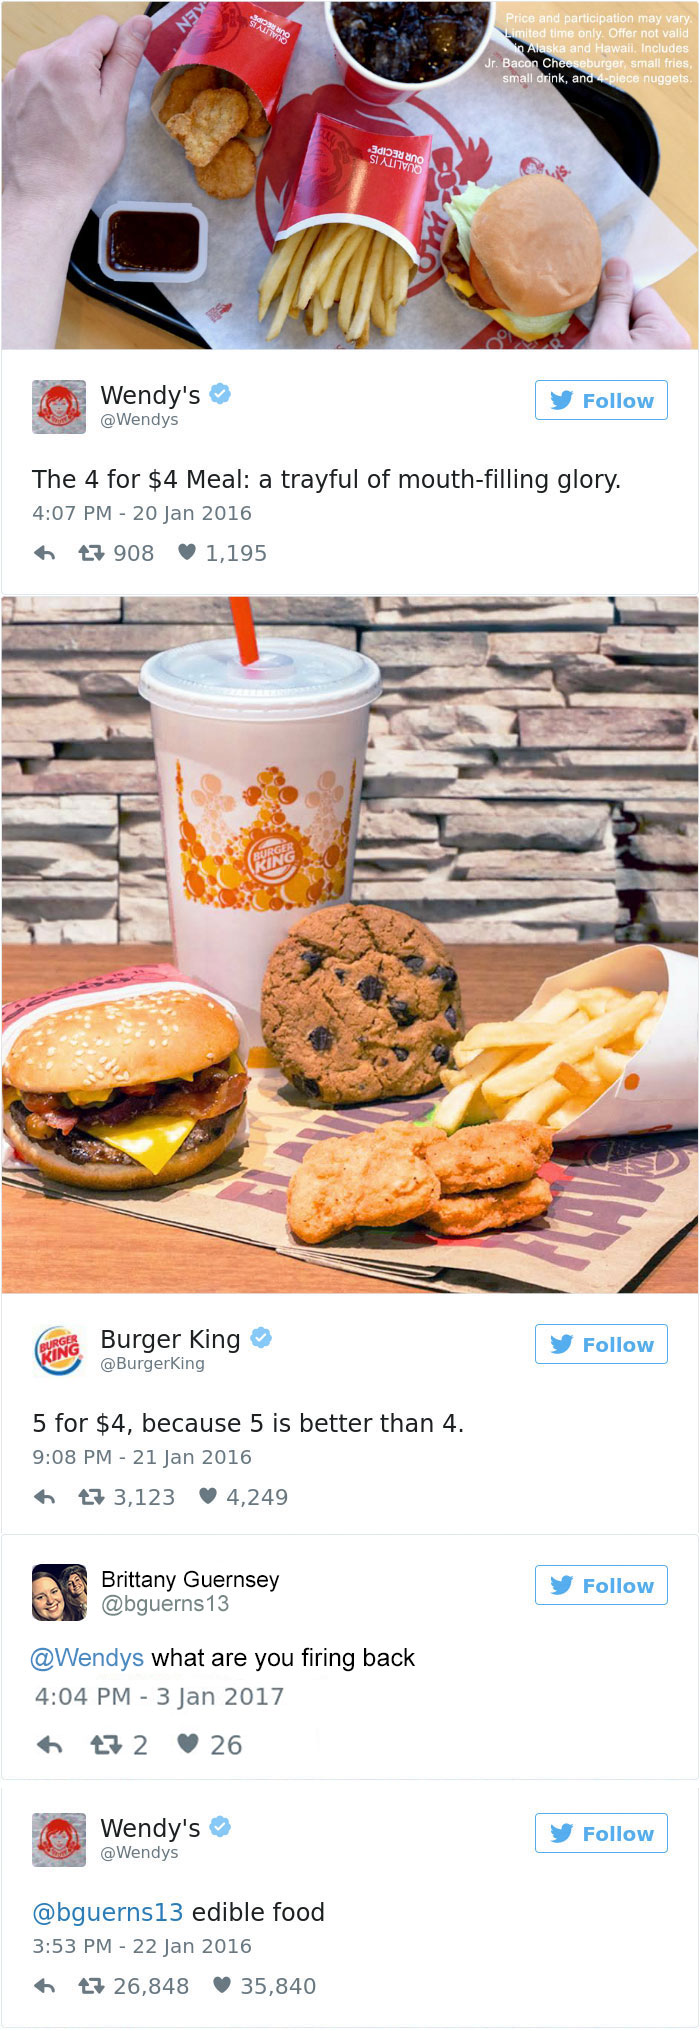 Wendy's Versus Burger King